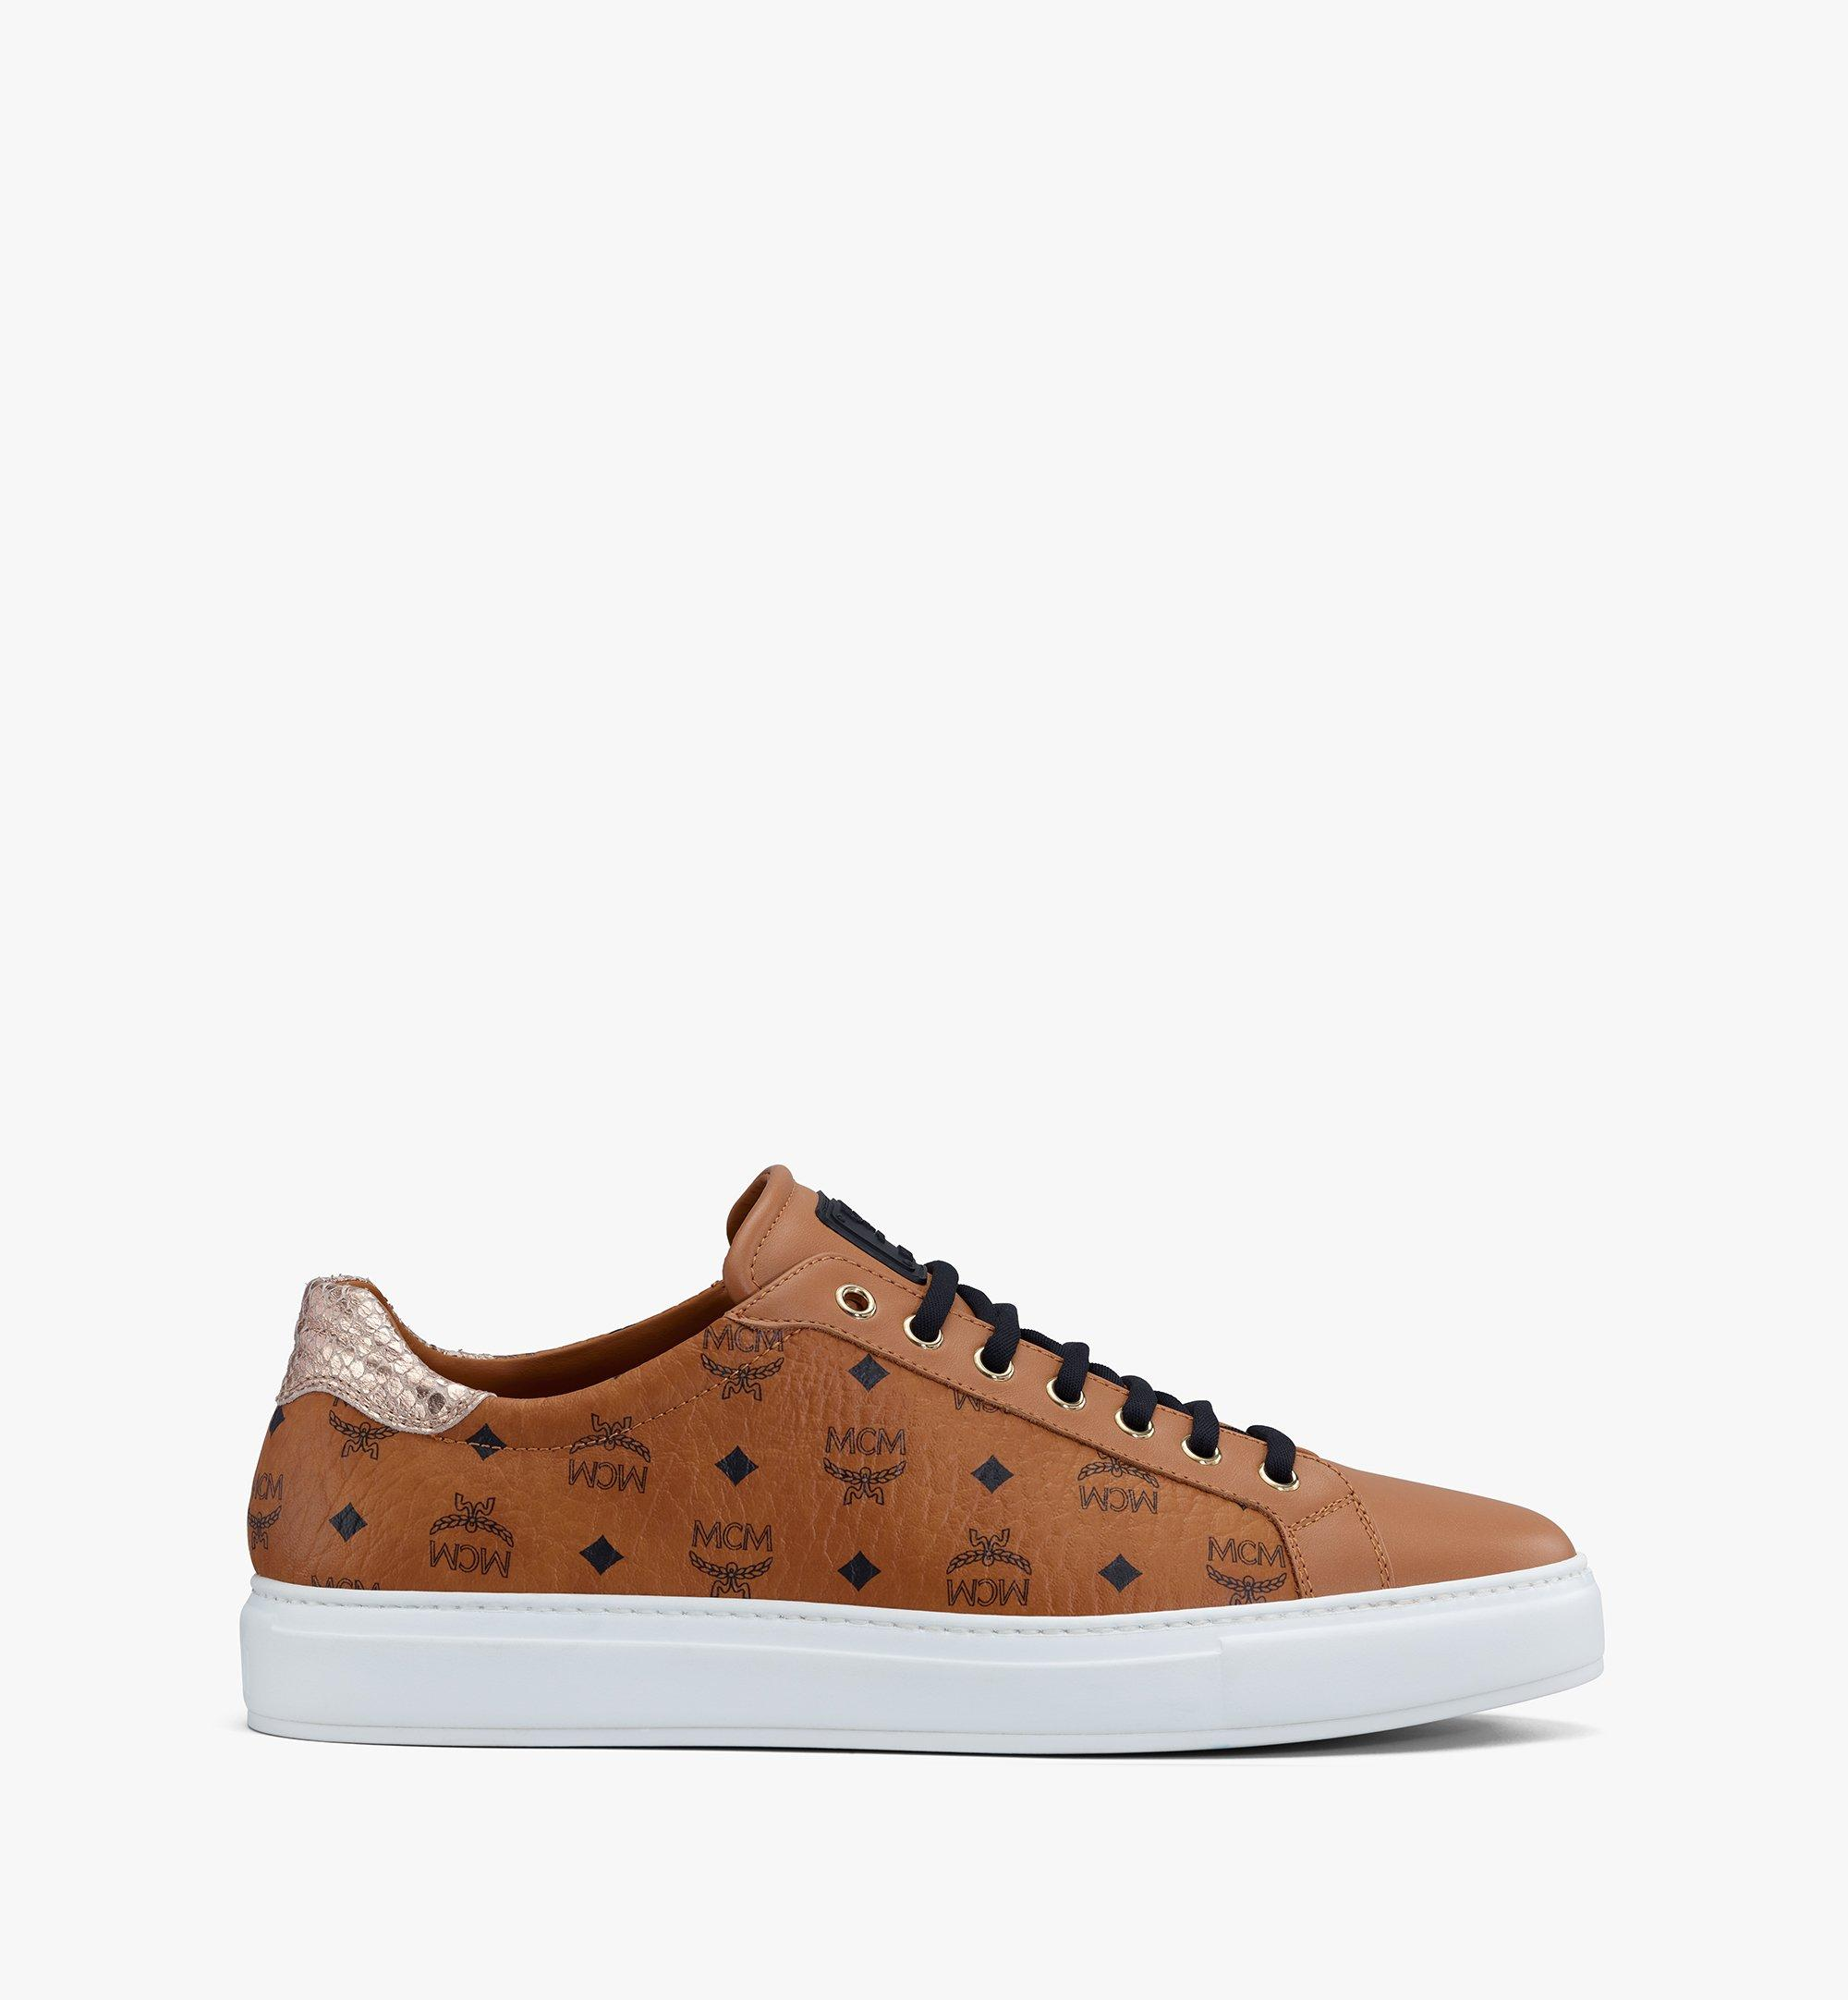 mcm sneaker low cognac